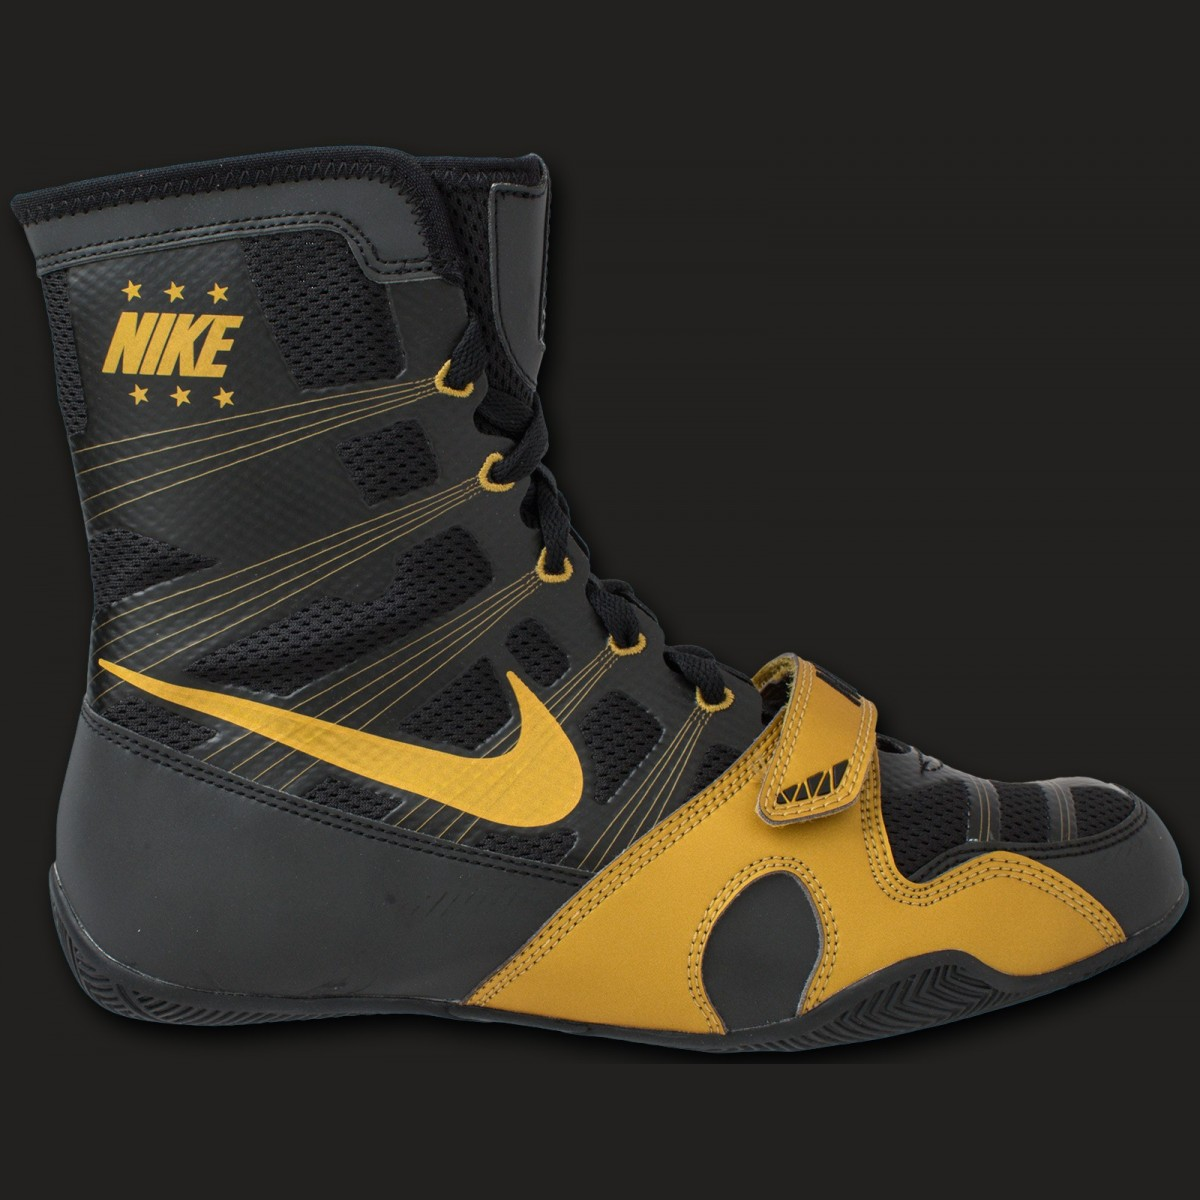 nike boxe chaussure